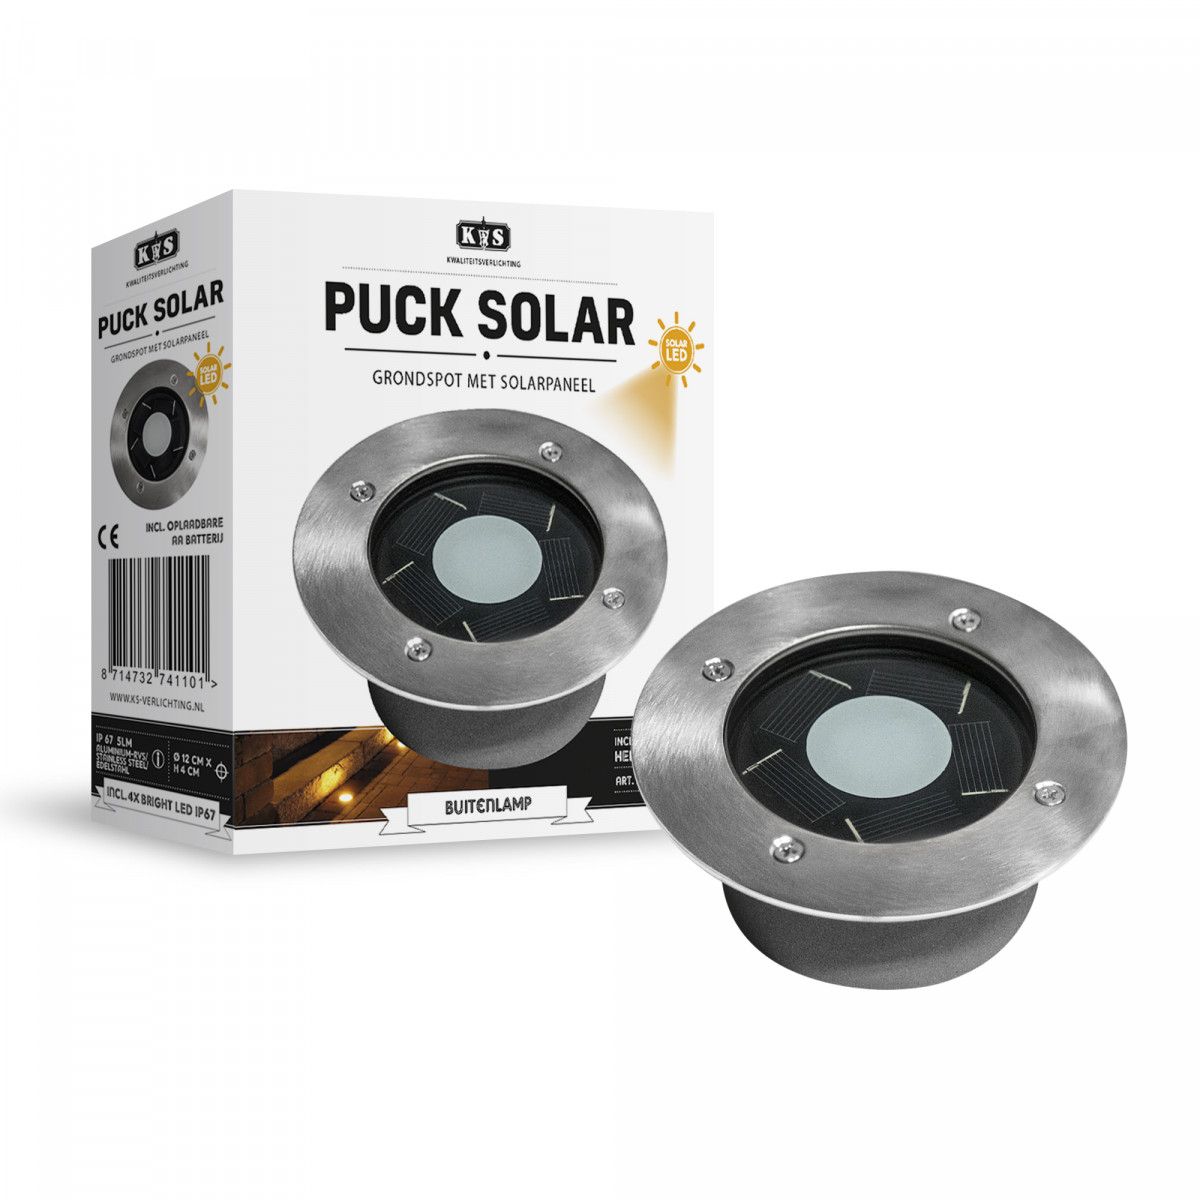 grondspots buiten - LED solar Grondspot Rond Puck solar set - nostalux tuinverlichting